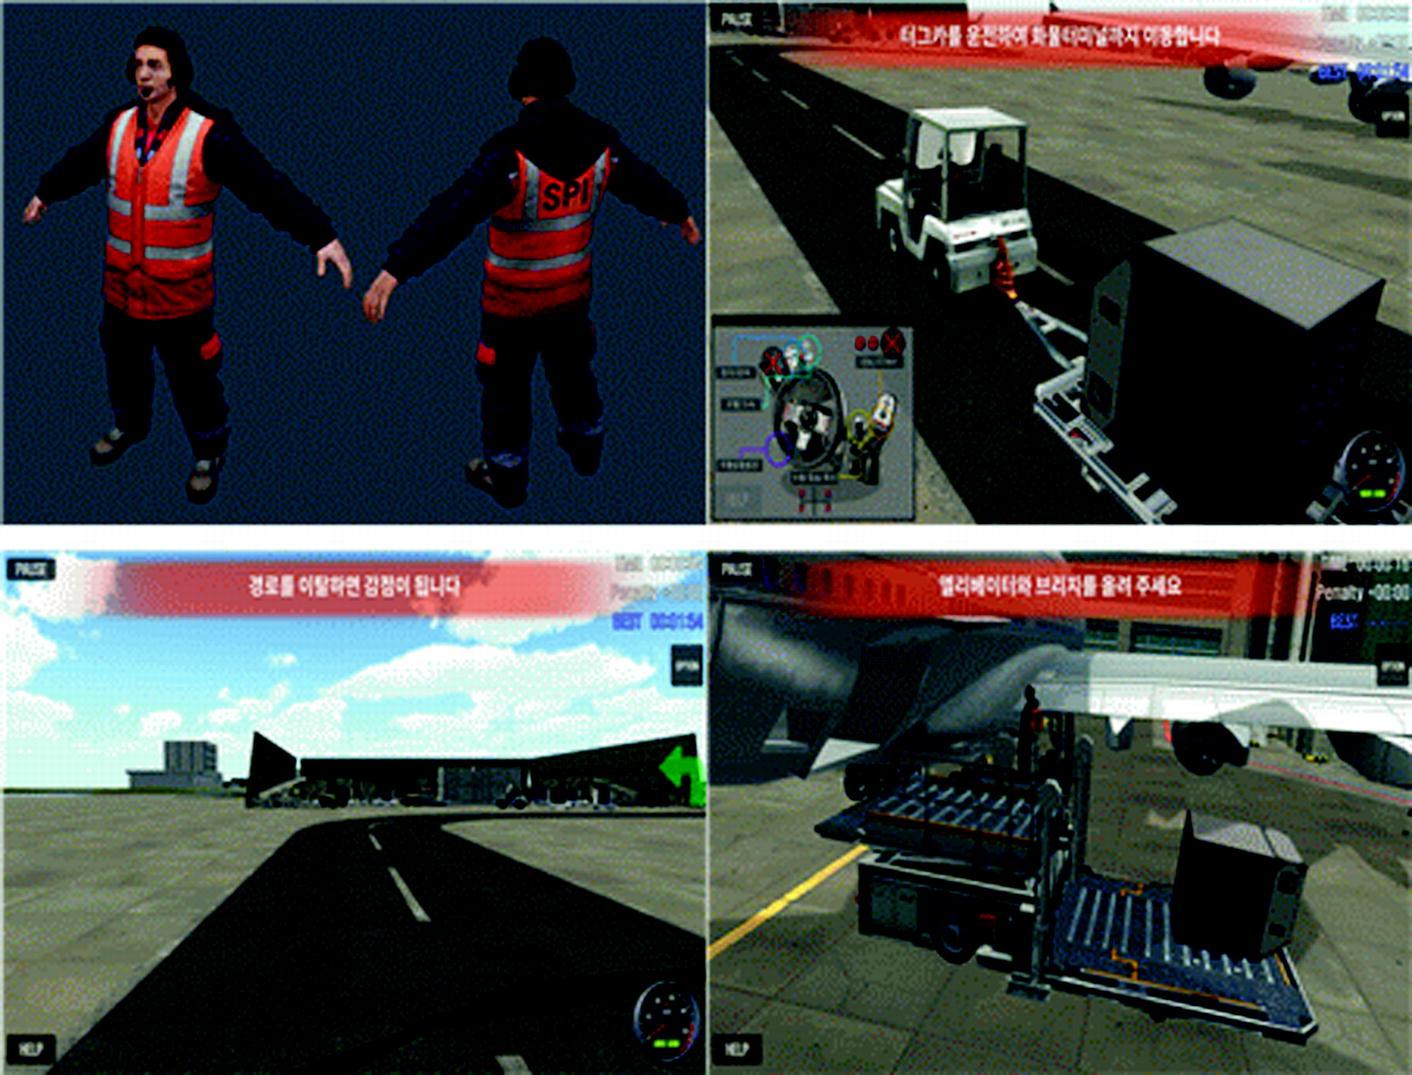 Development of Immersive Vehicle Simulator for Aircraft Ground